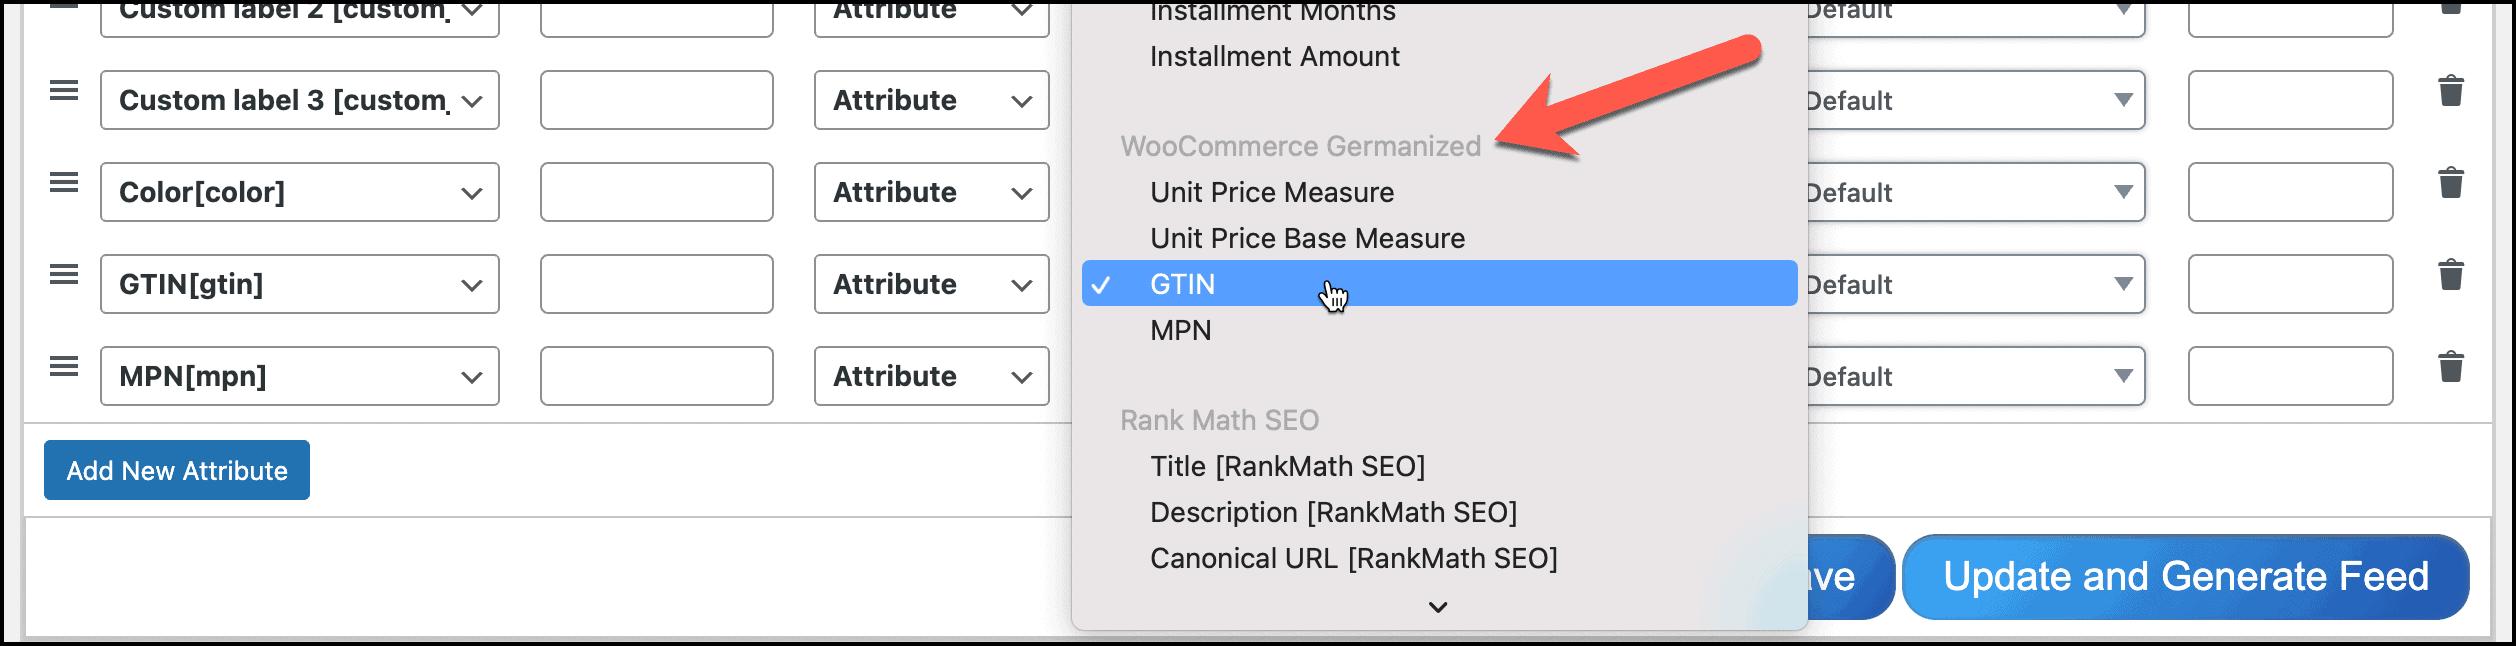 WooCommerce Germanized GTIN MPN feed config